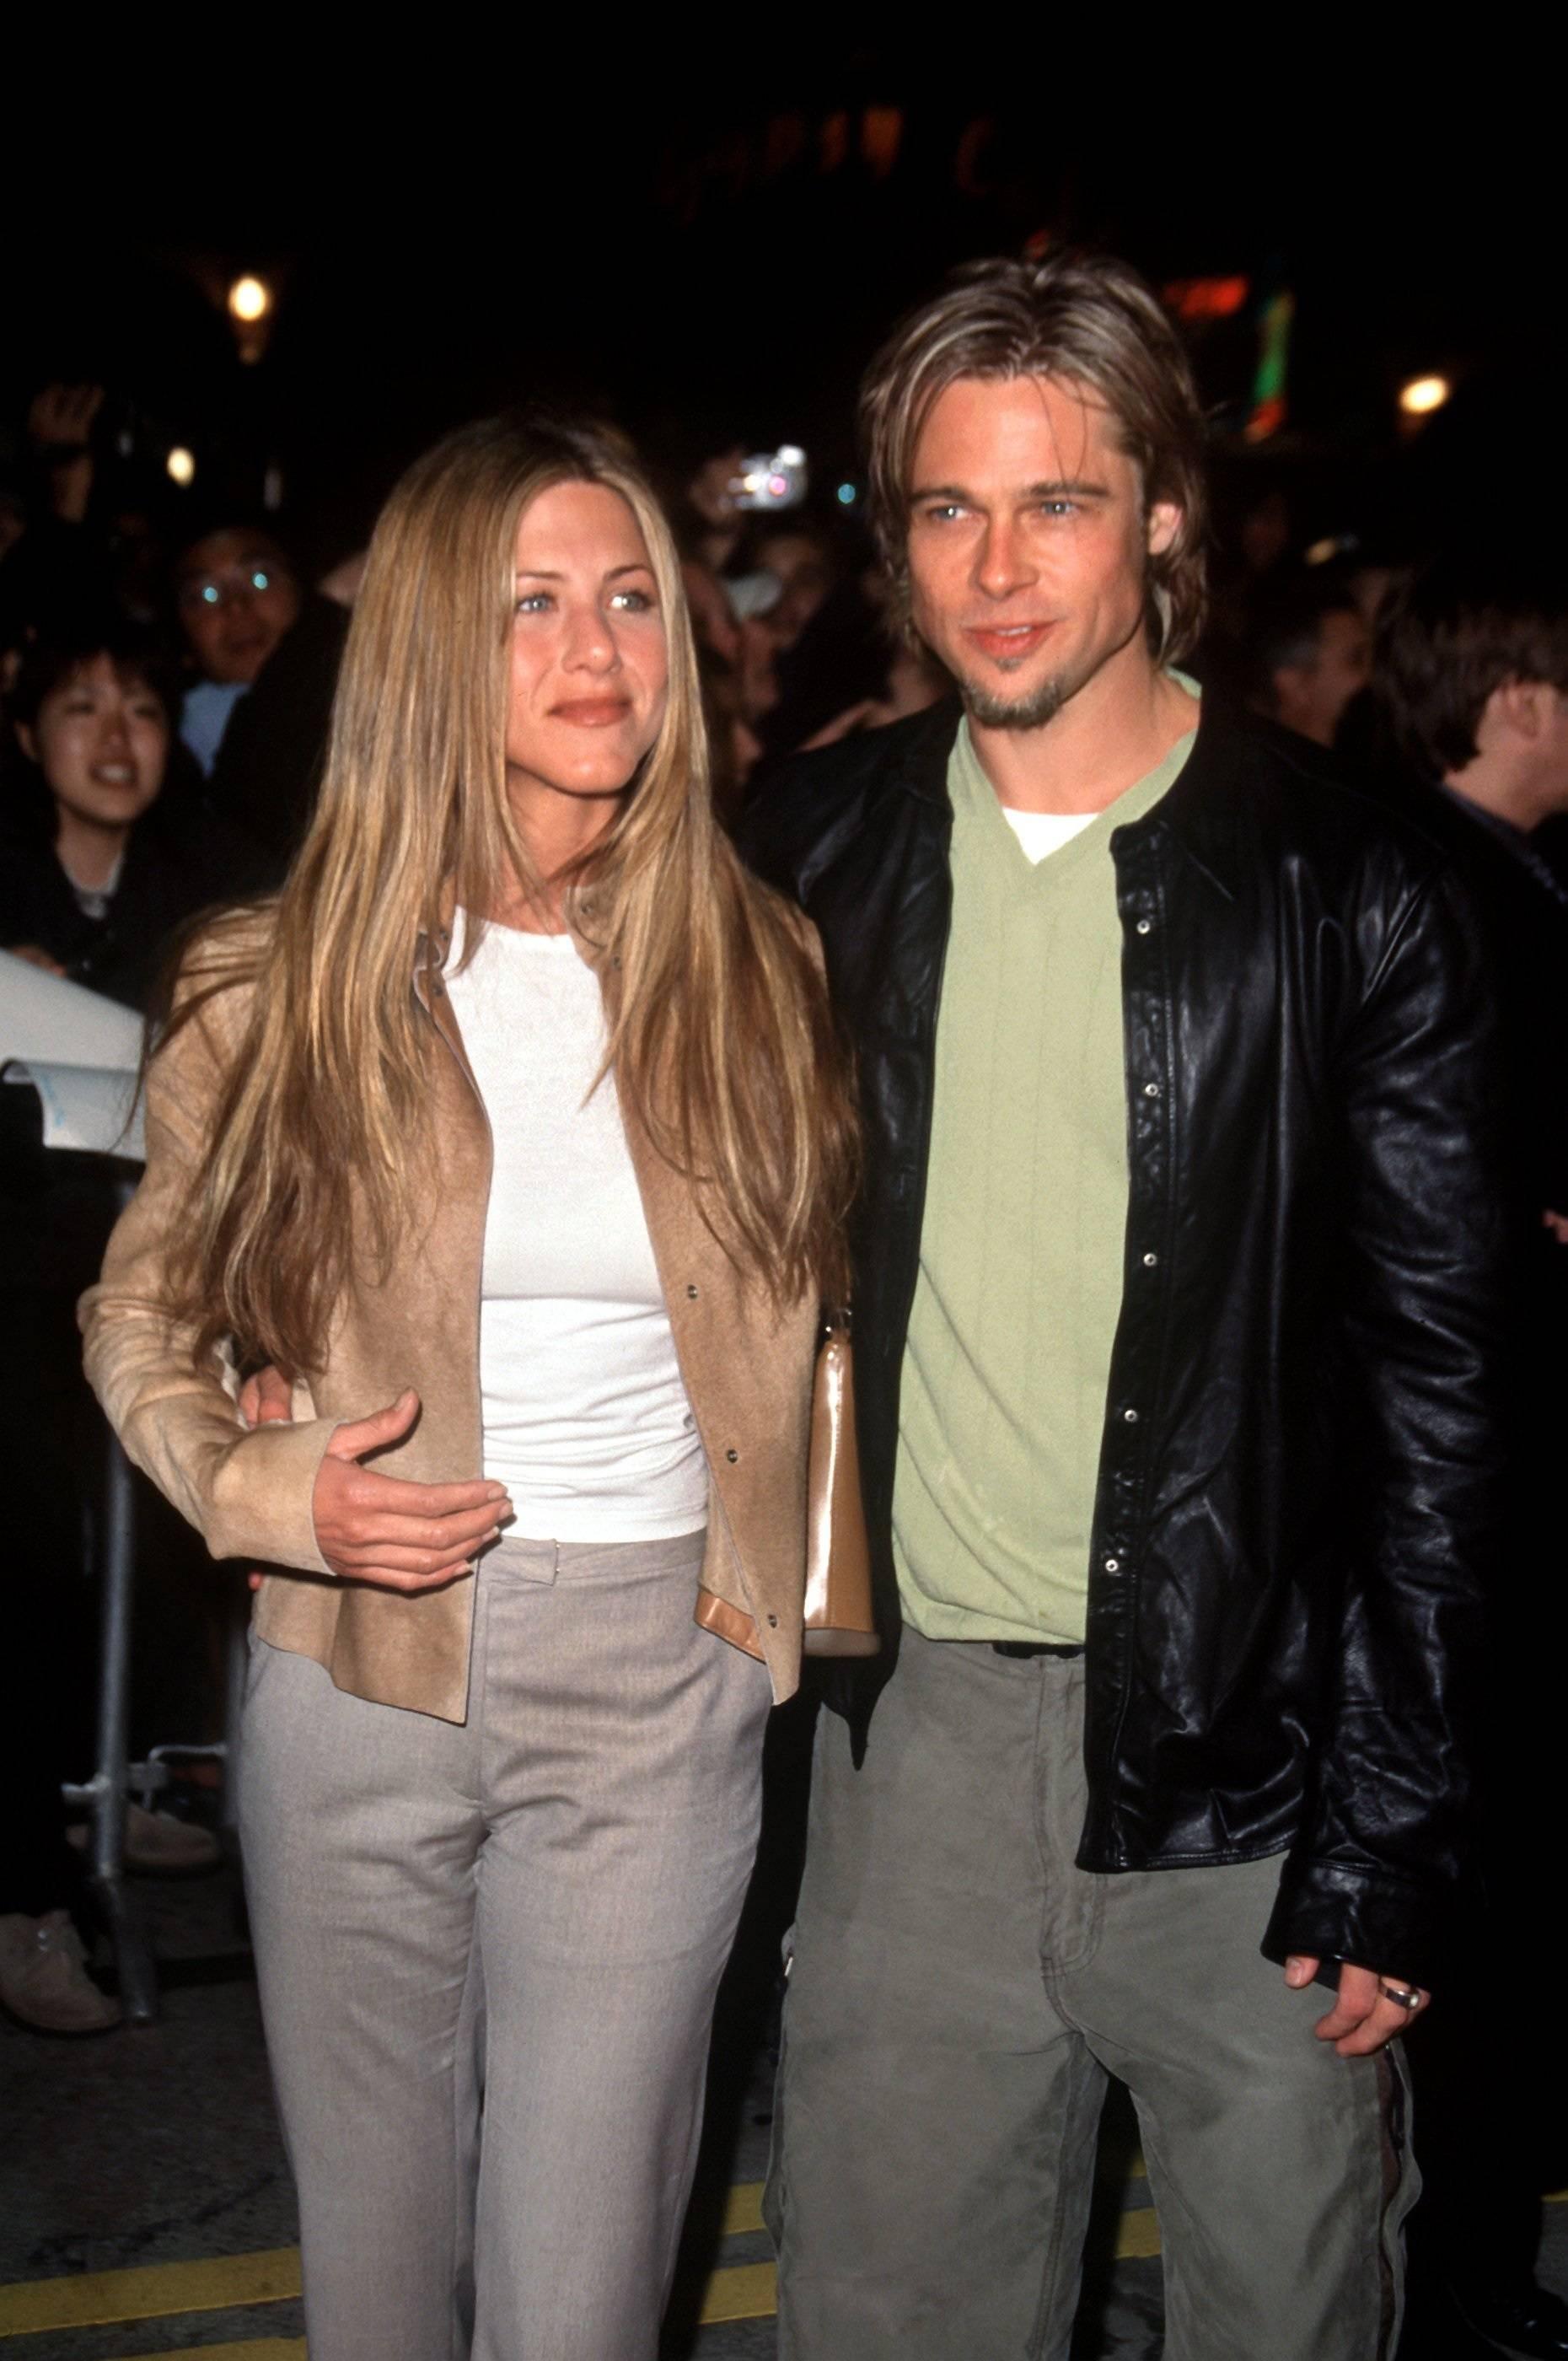 Brad Pitt and Jennifer Aniston allegedly broke up